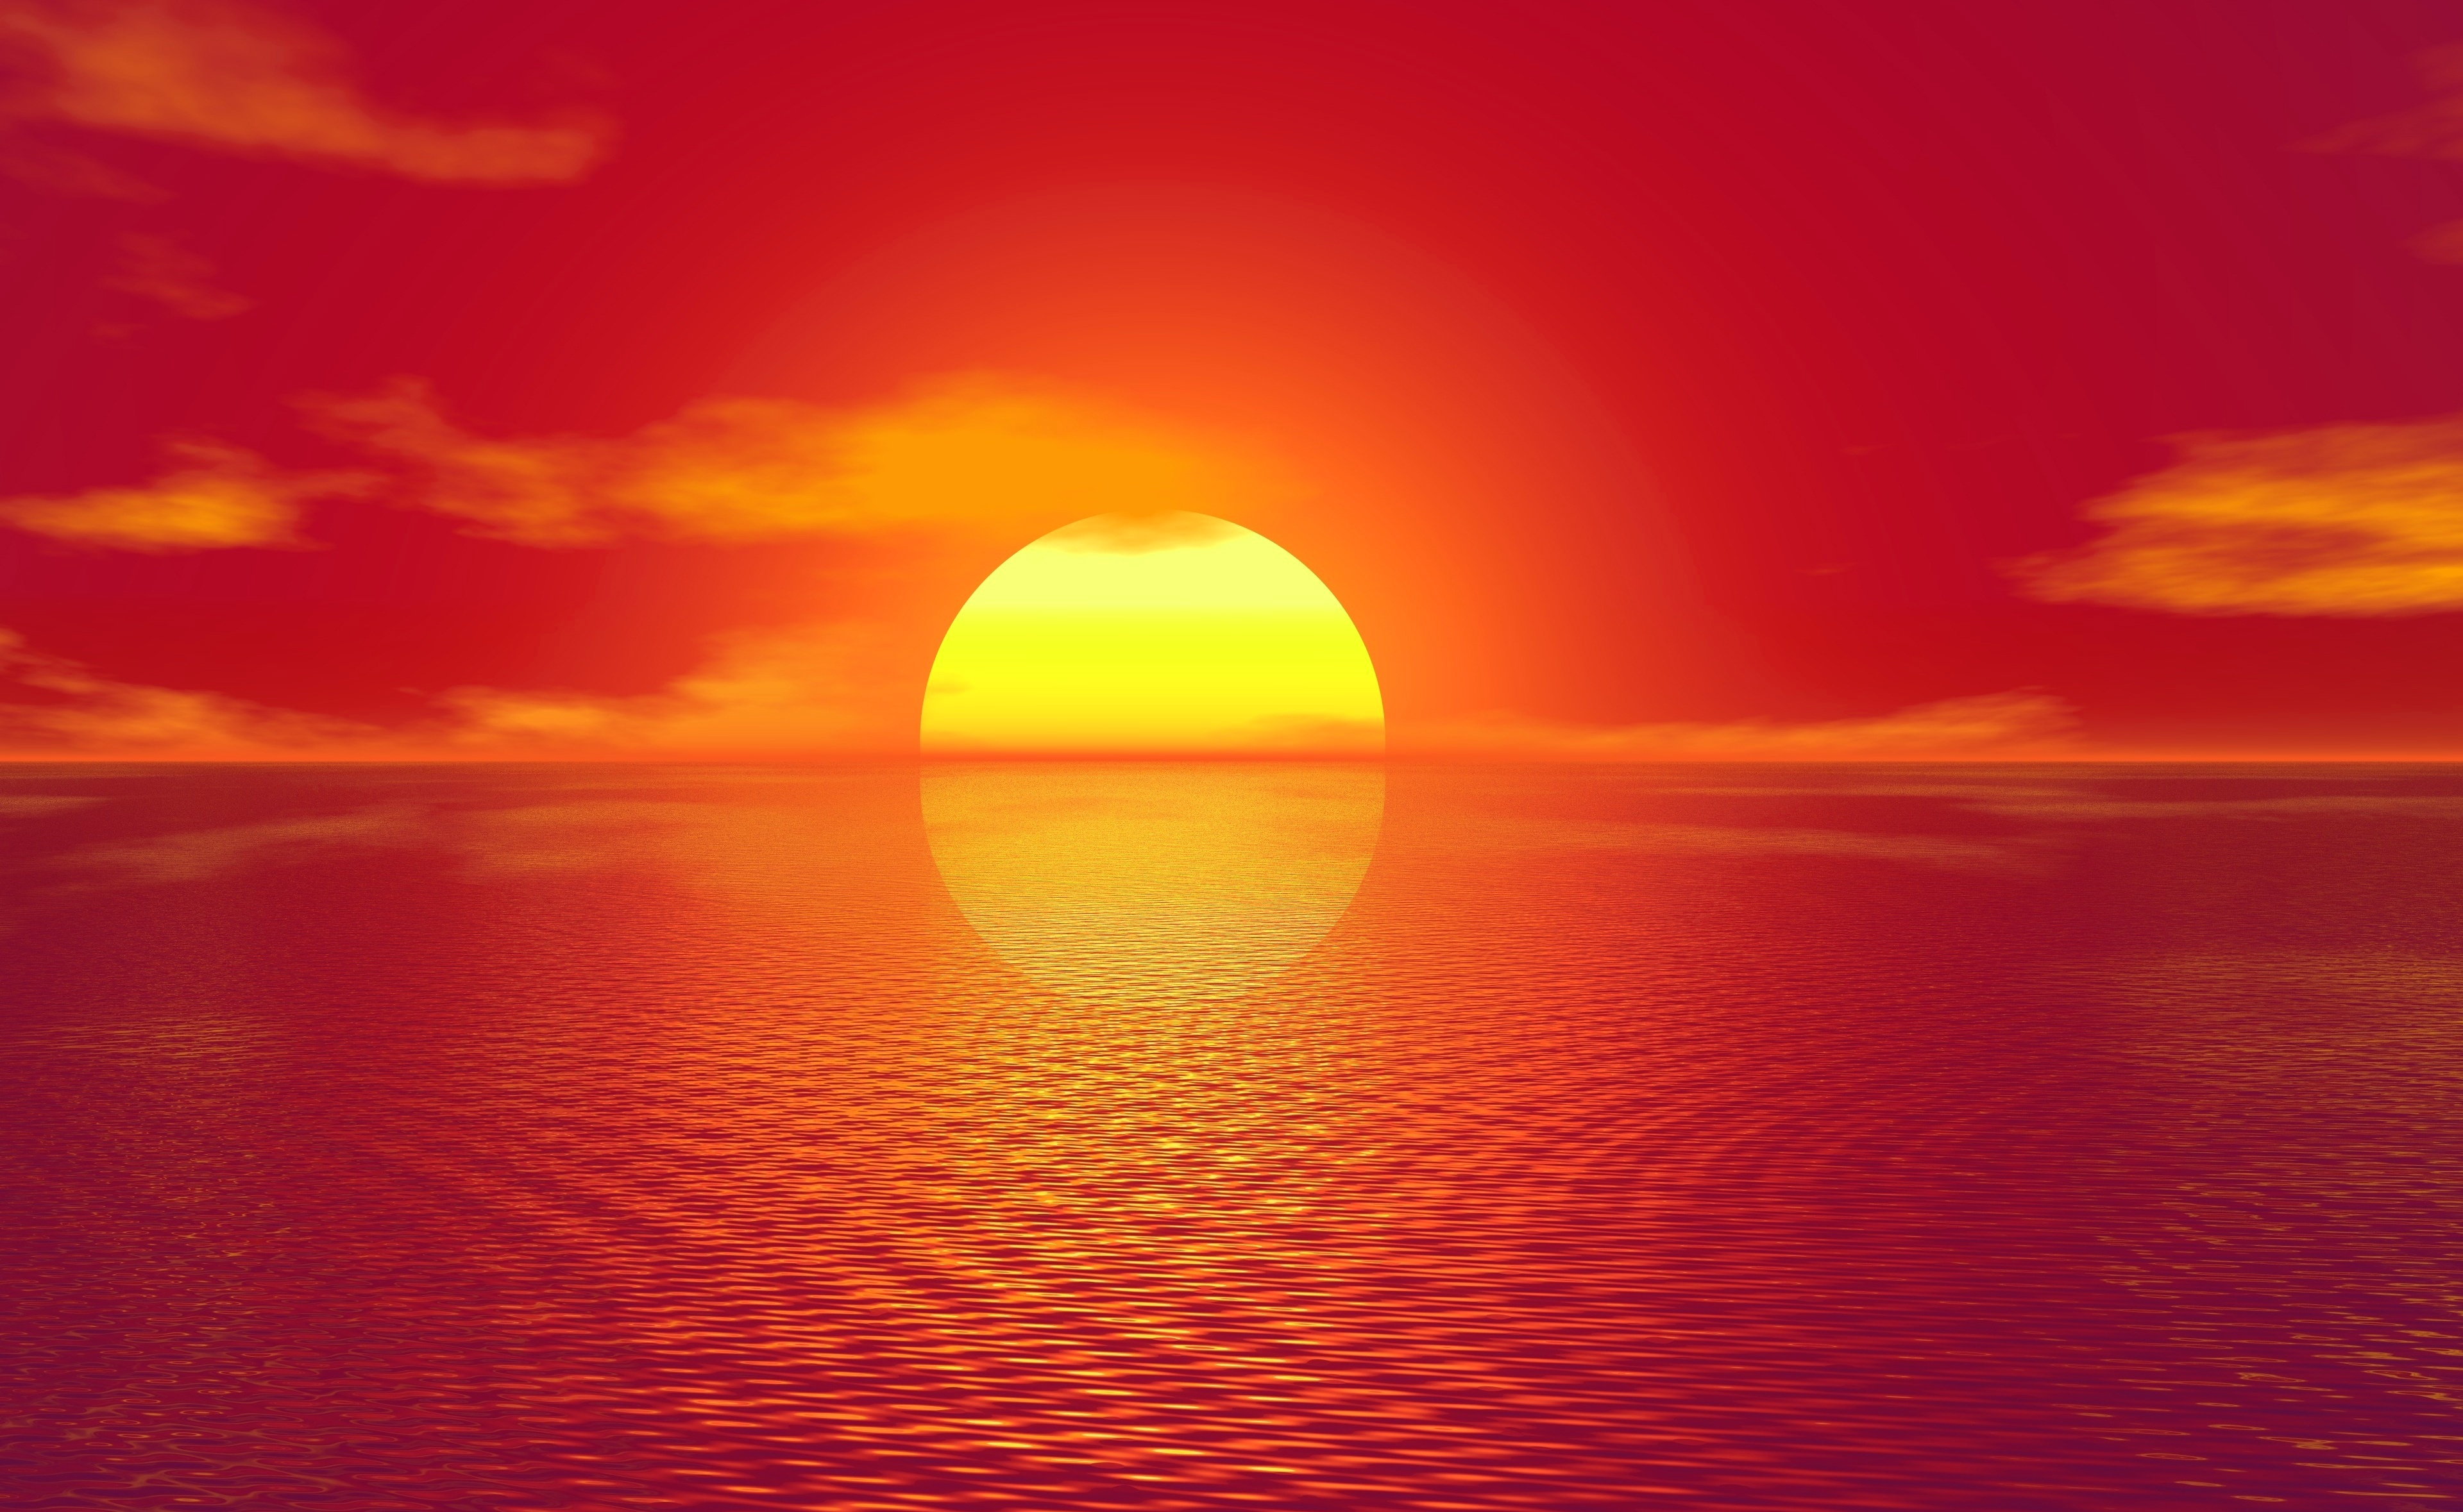 Sunset 4k Ultra Hd Wallpaper Background Image 3840x2358 Id